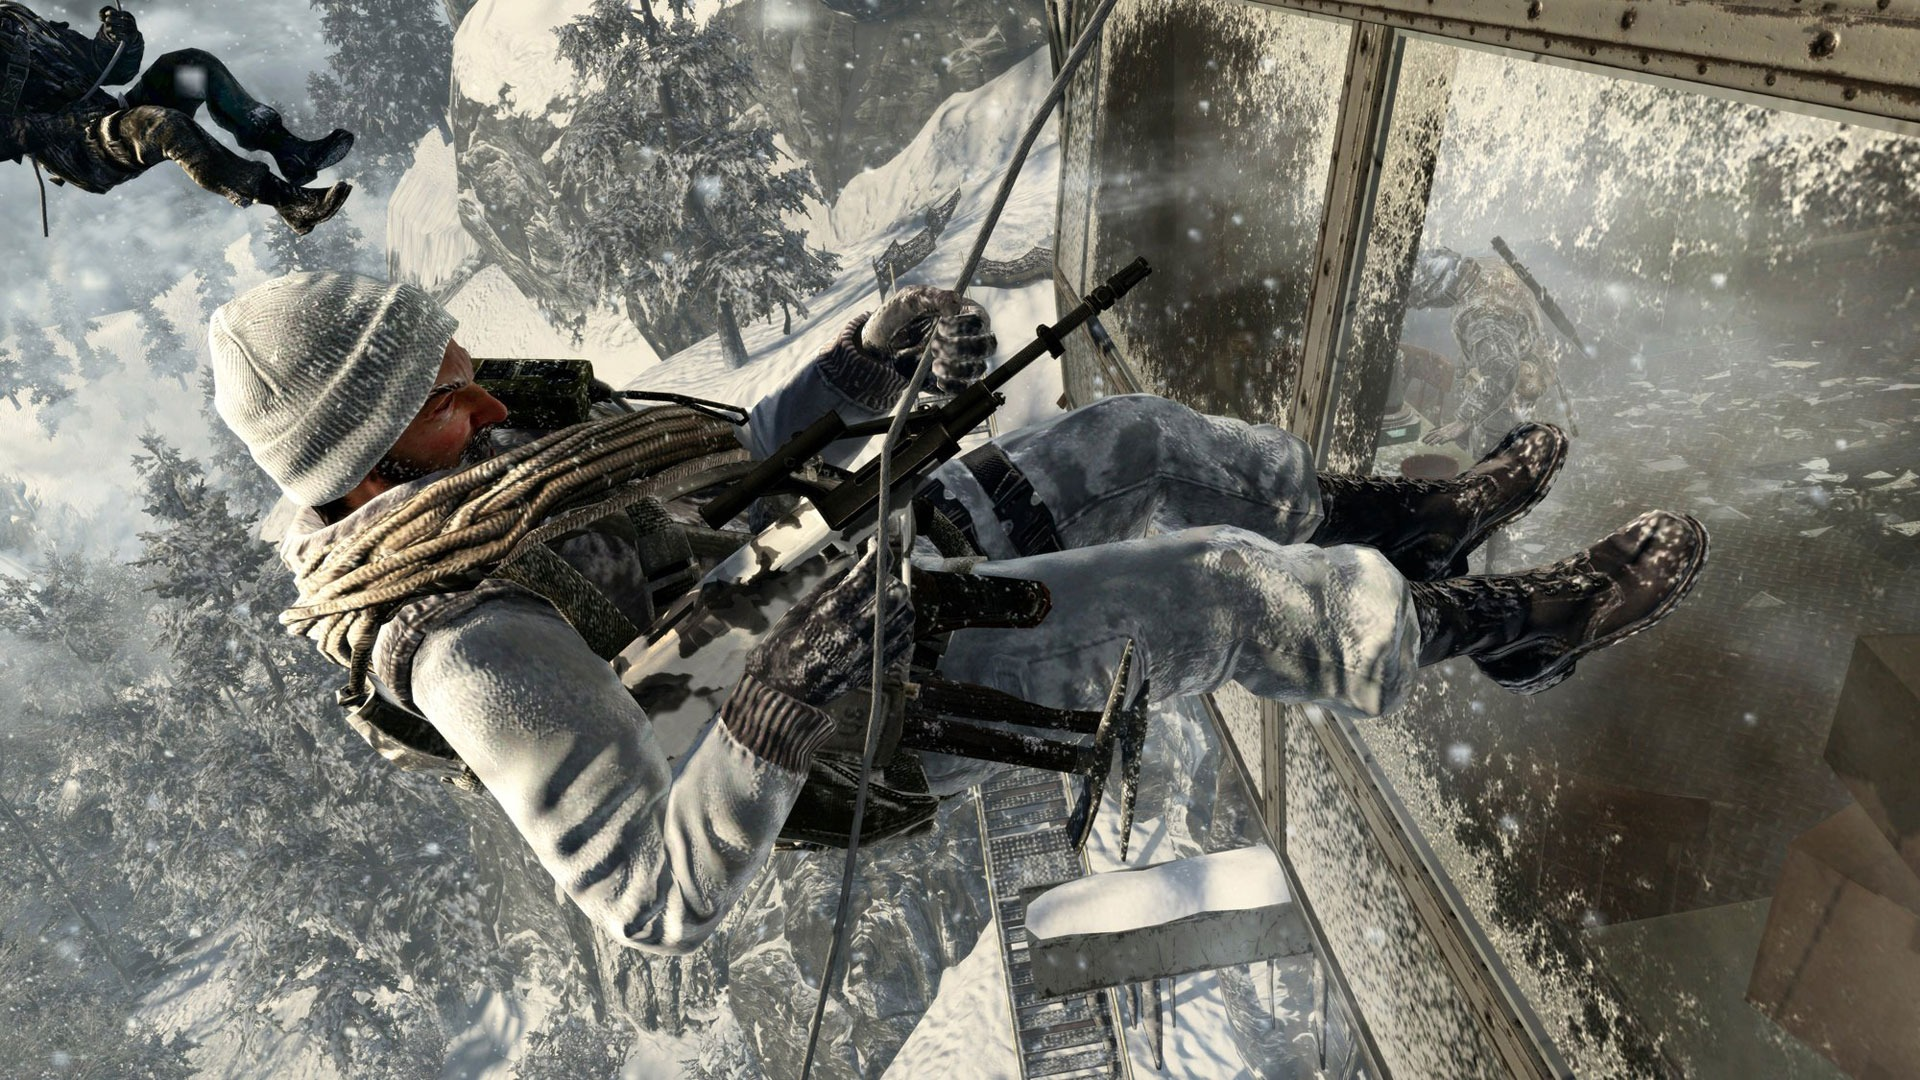 Call Of Duty Wallpaper 1920x1080